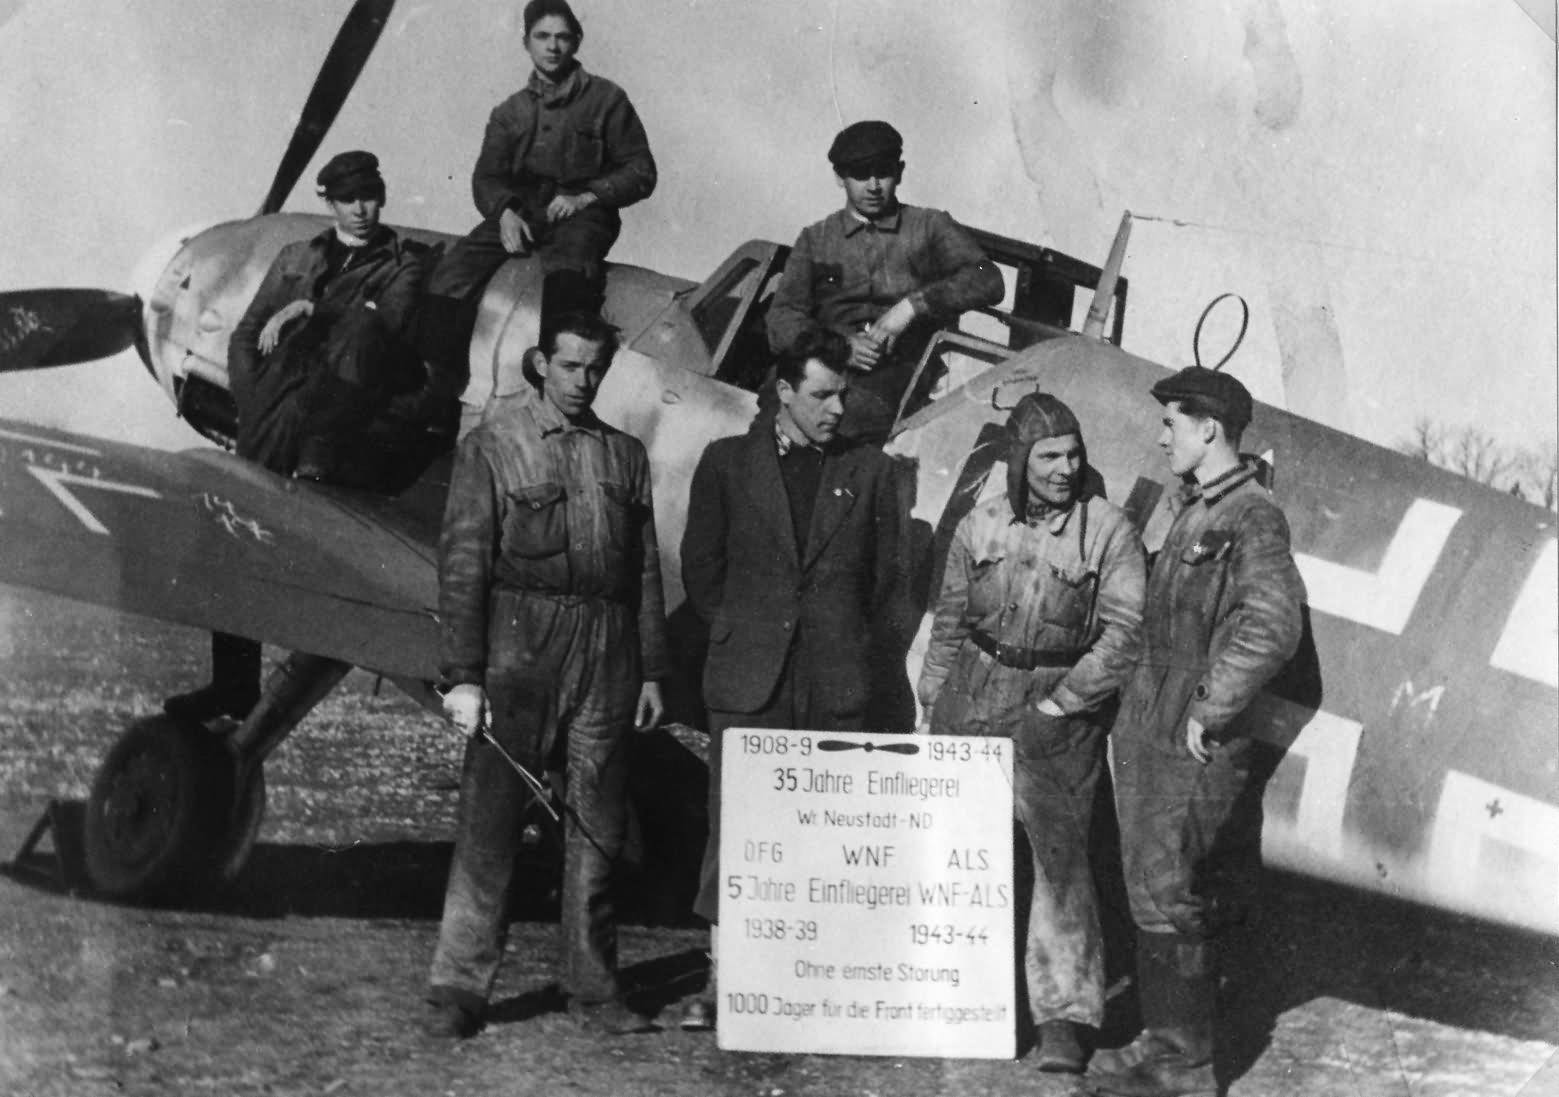 Messerschmitt Bf 109 G Wiener Neustadter Flugzeugwerke 1944